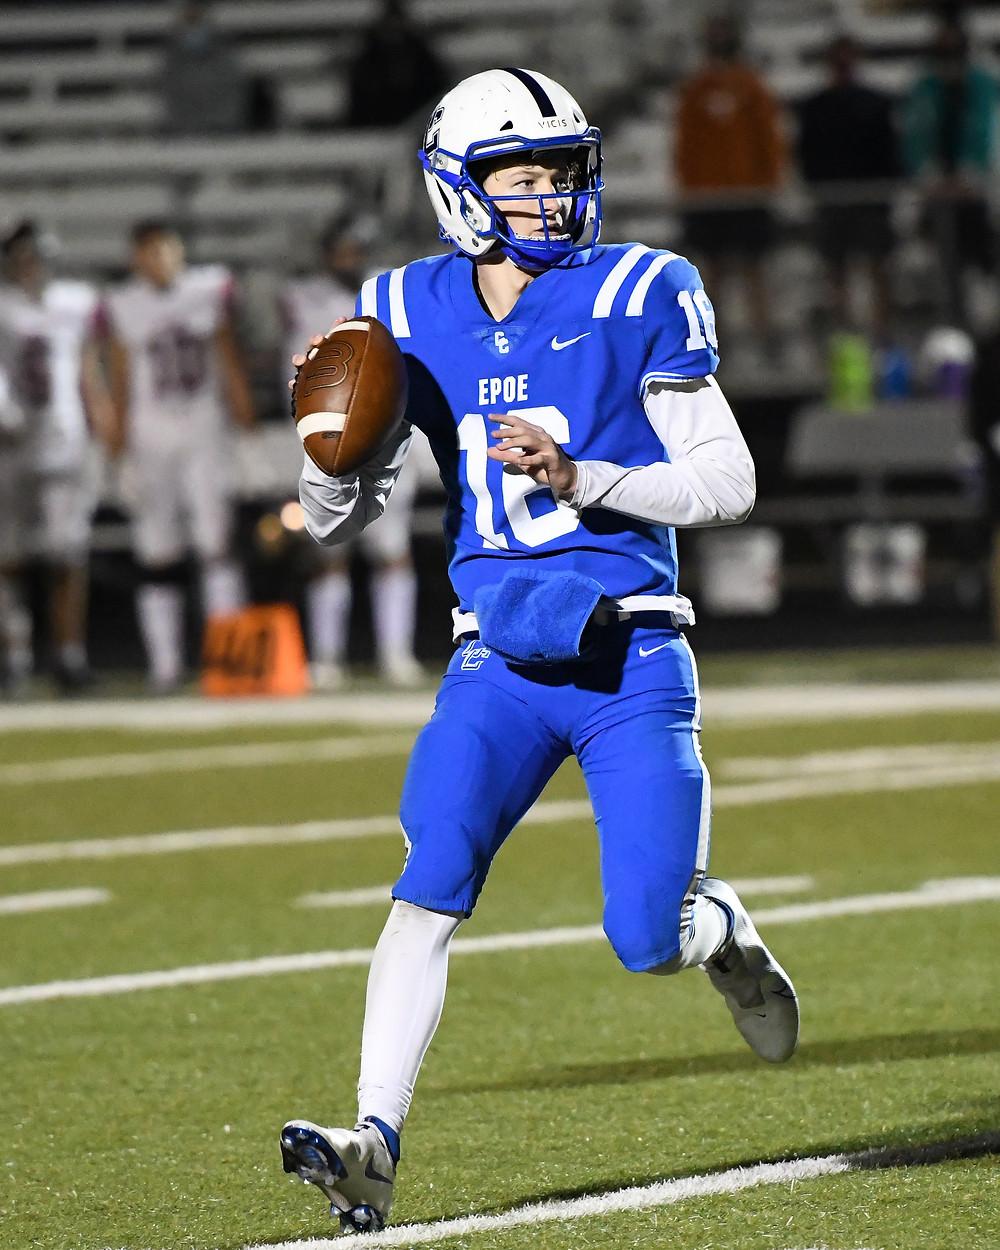 Brock McLaughlin, Cedar Creek High School Eagles Football